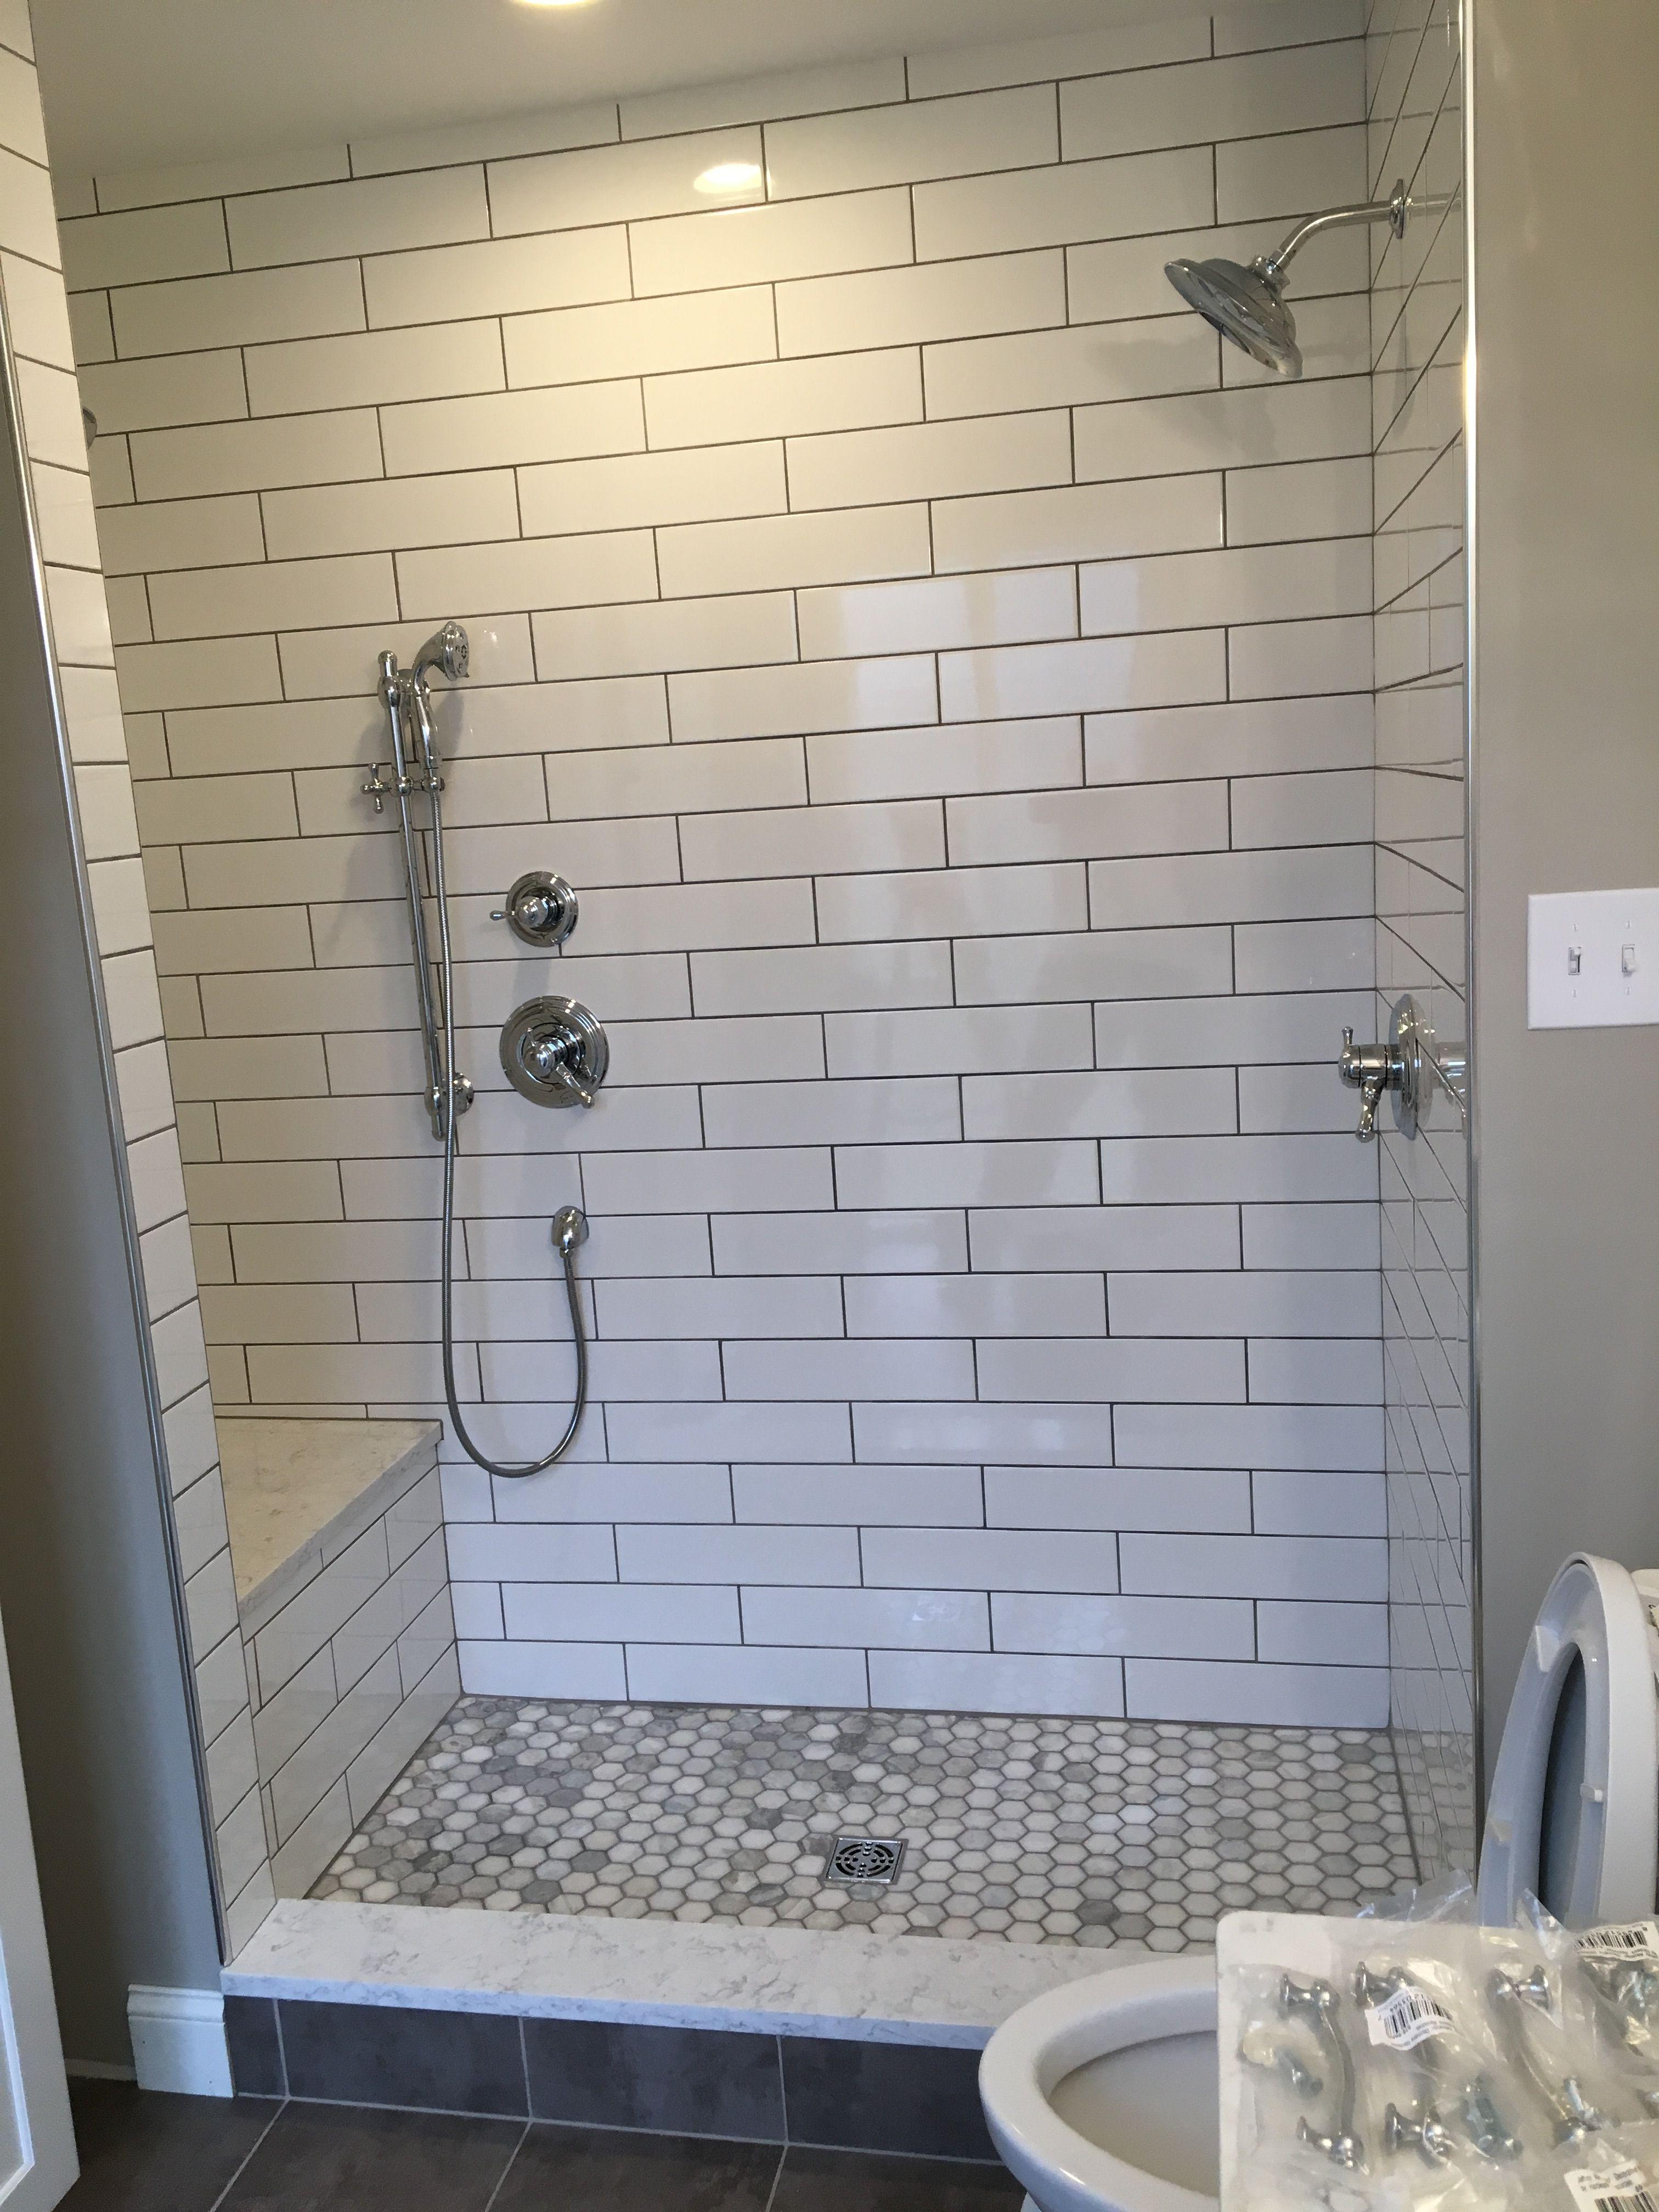 Soho Tile Delta Fixtures Shower Featuring Schluter Kerdi System Buchheit Herculaneum Tub To Shower Conversion Bathrooms Remodel Master Bath Remodel